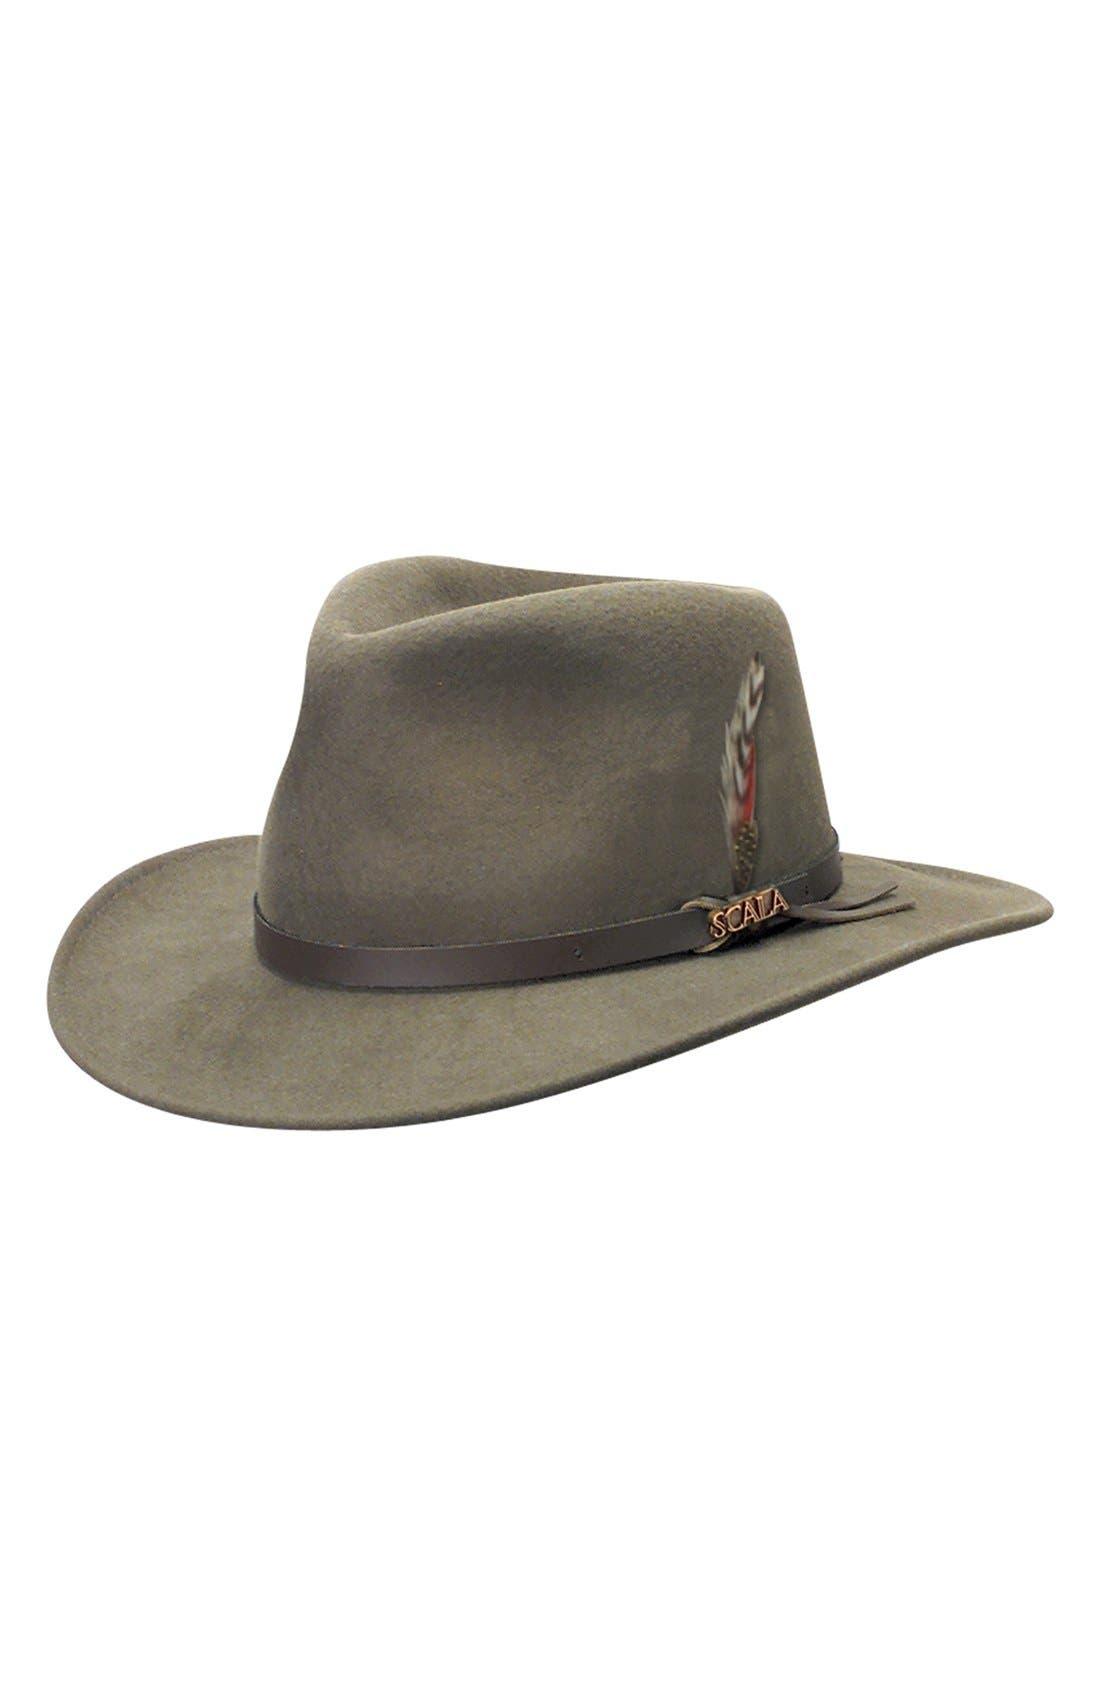 Main Image - Scala 'Classico' Crushable Felt Outback Hat